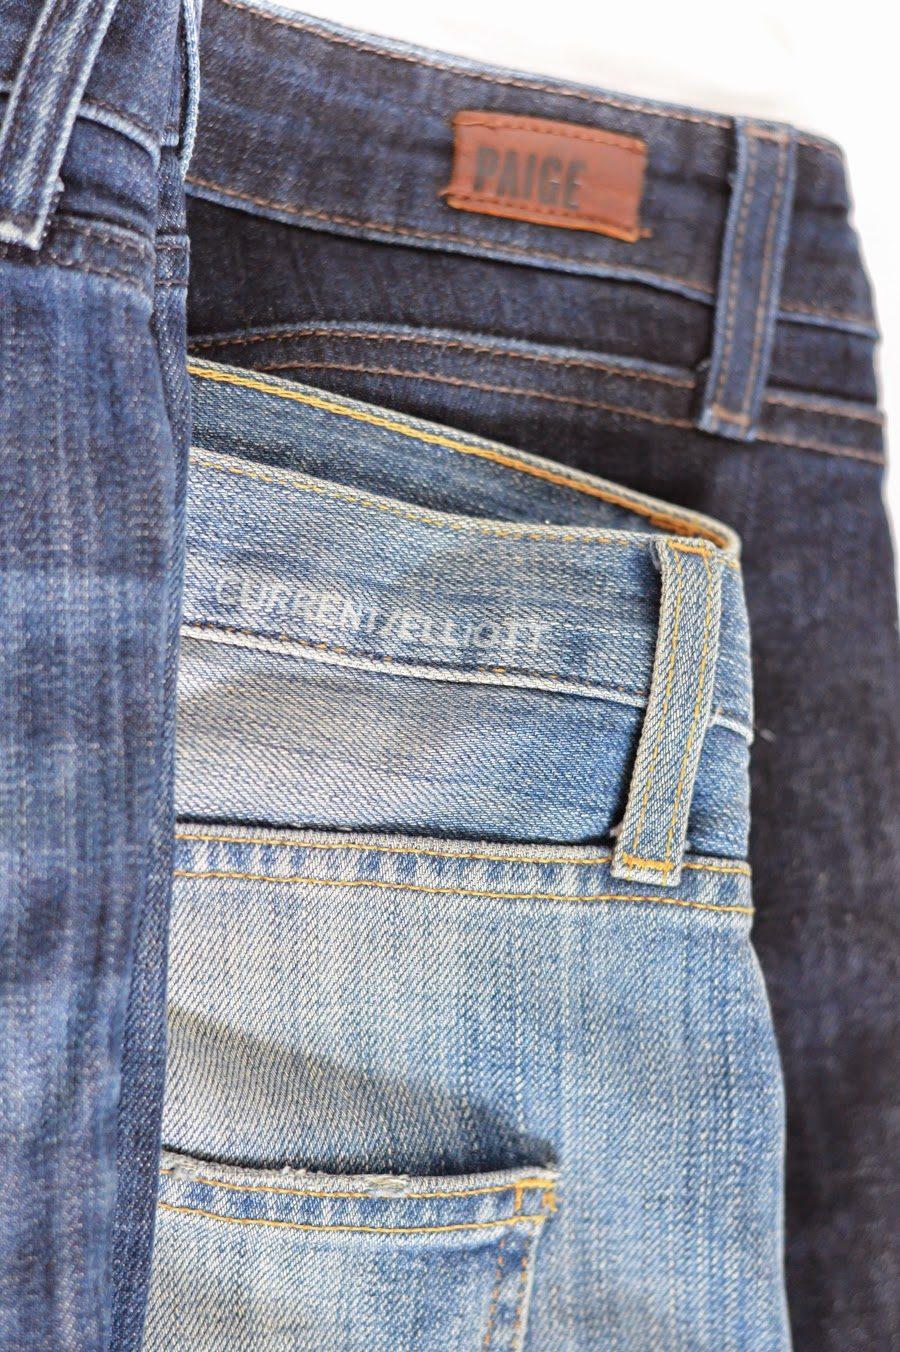 Should You Wash Jeans